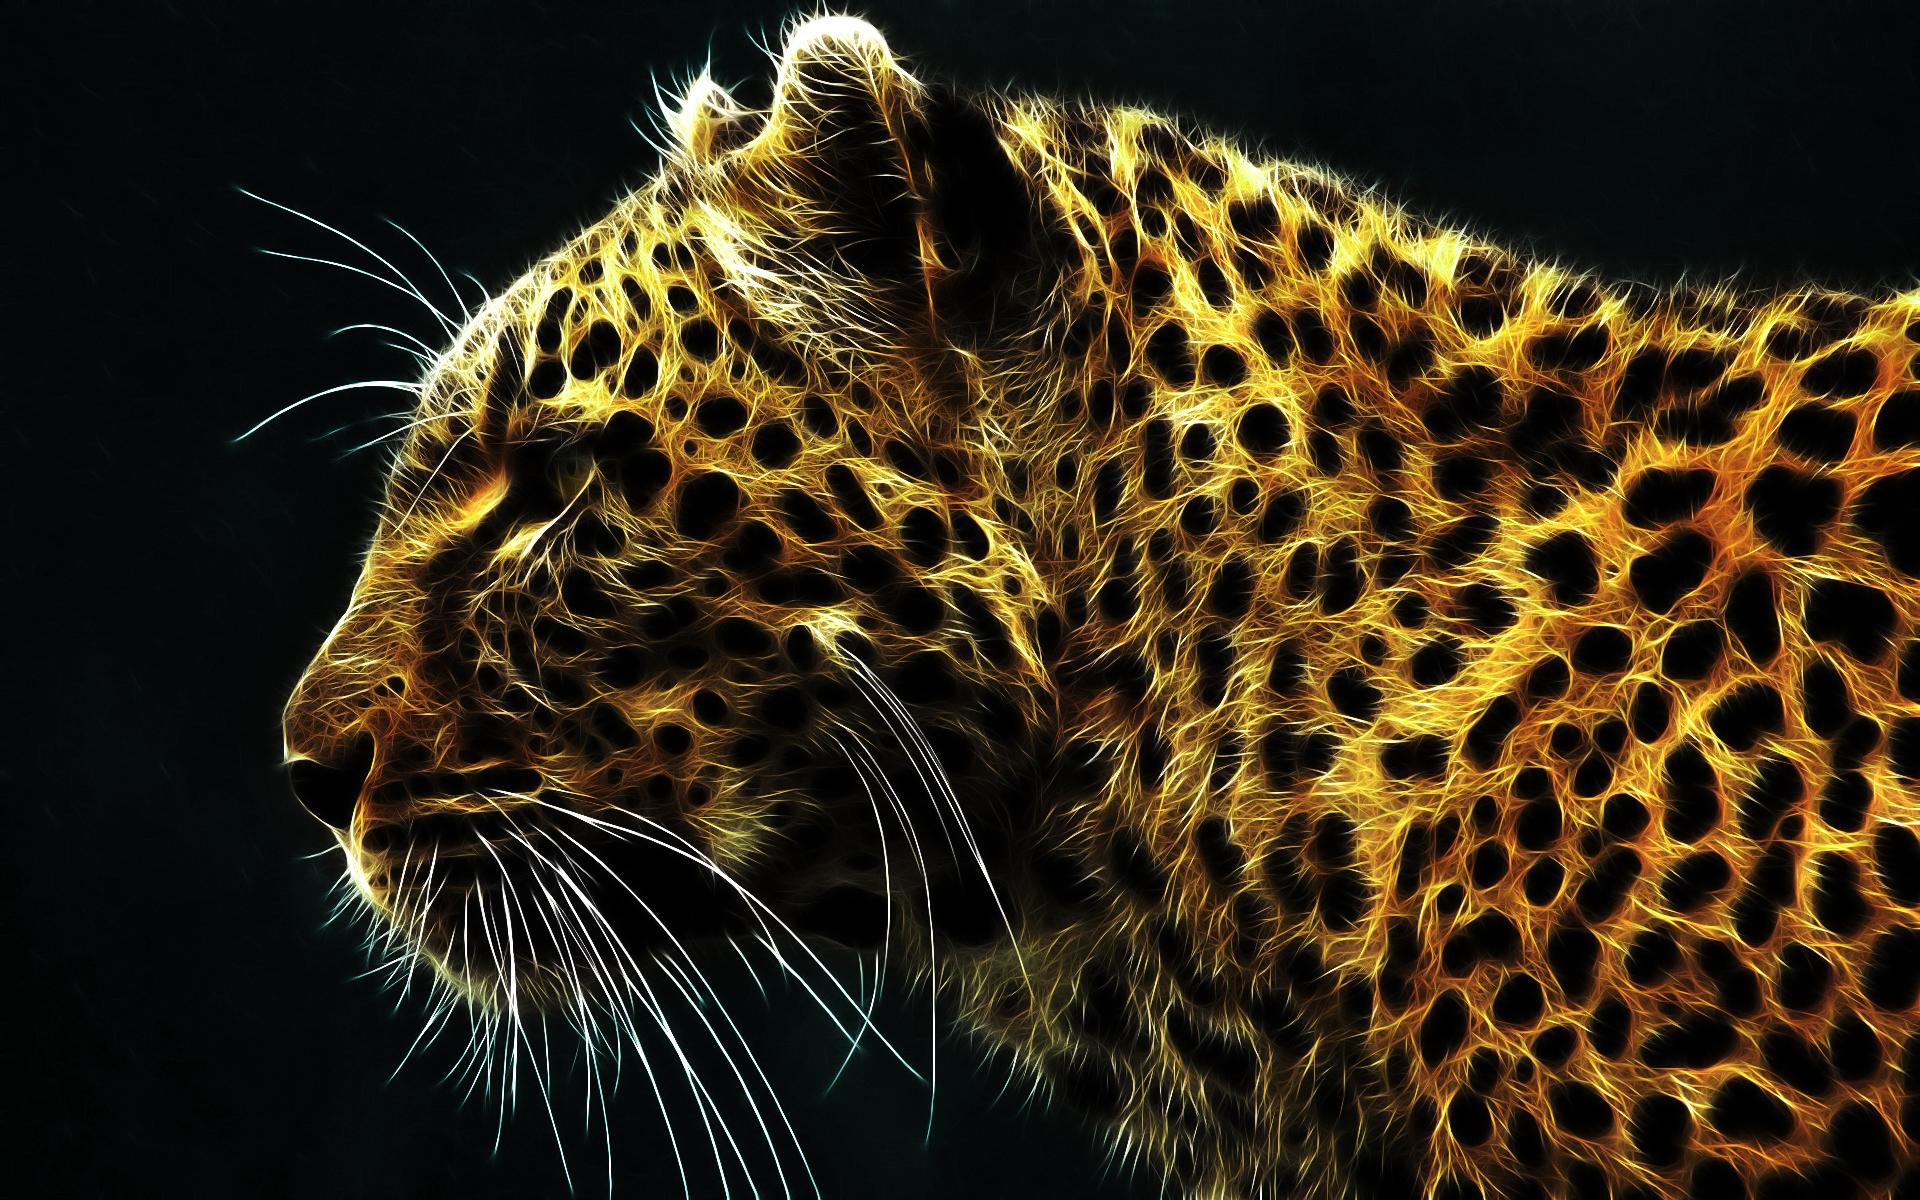 Digital Leopard Wallpapers HD Wallpapers 1920x1200